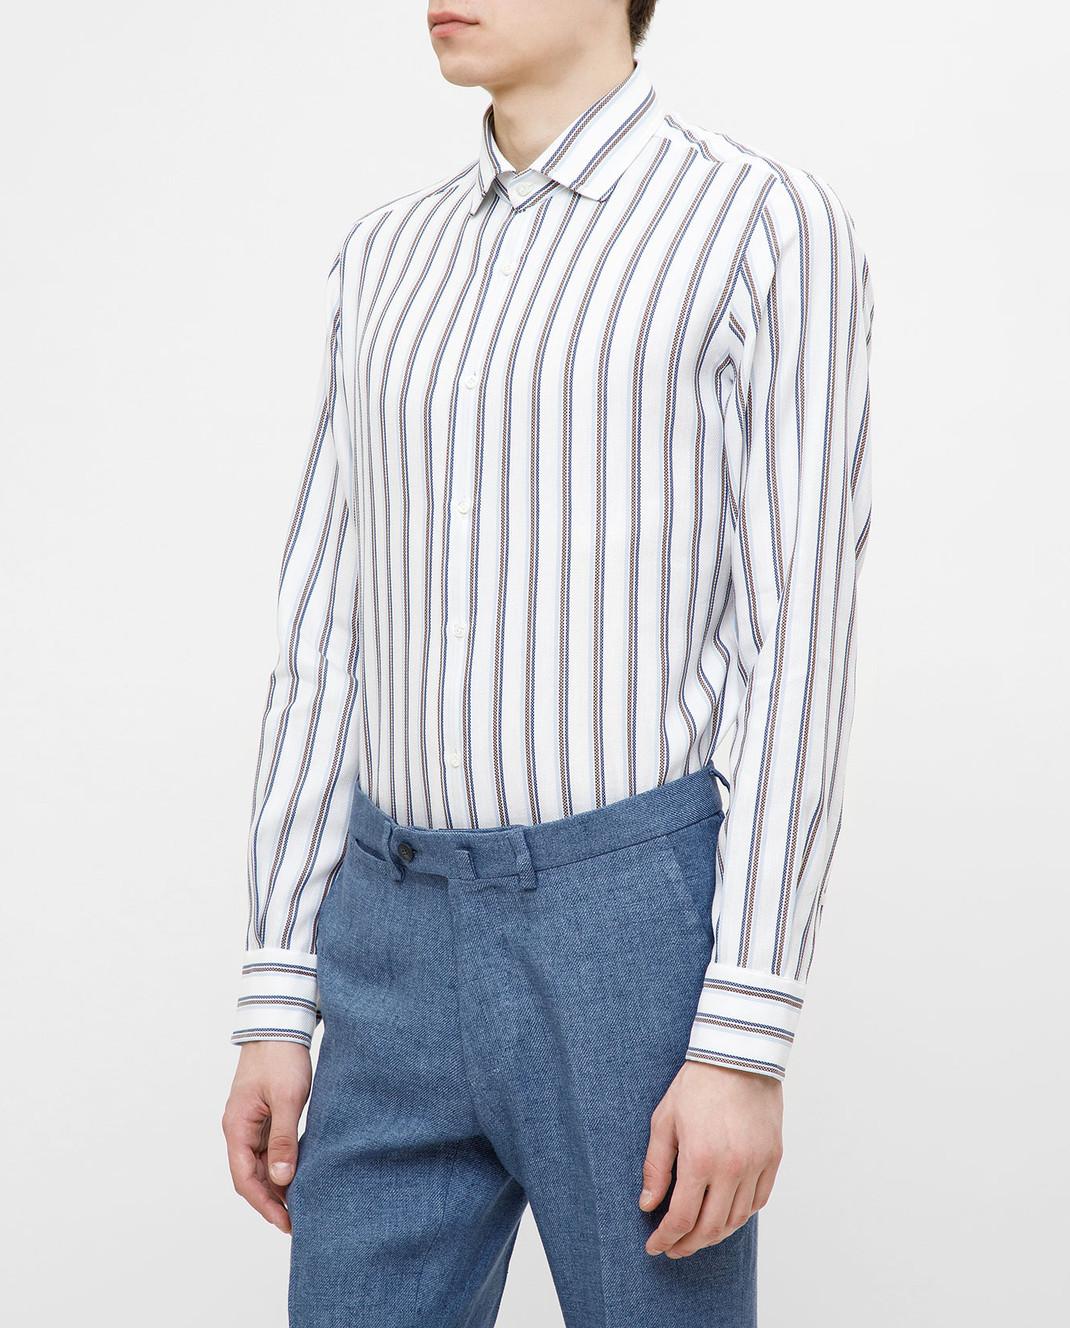 Stile Latino Белая рубашка изображение 3